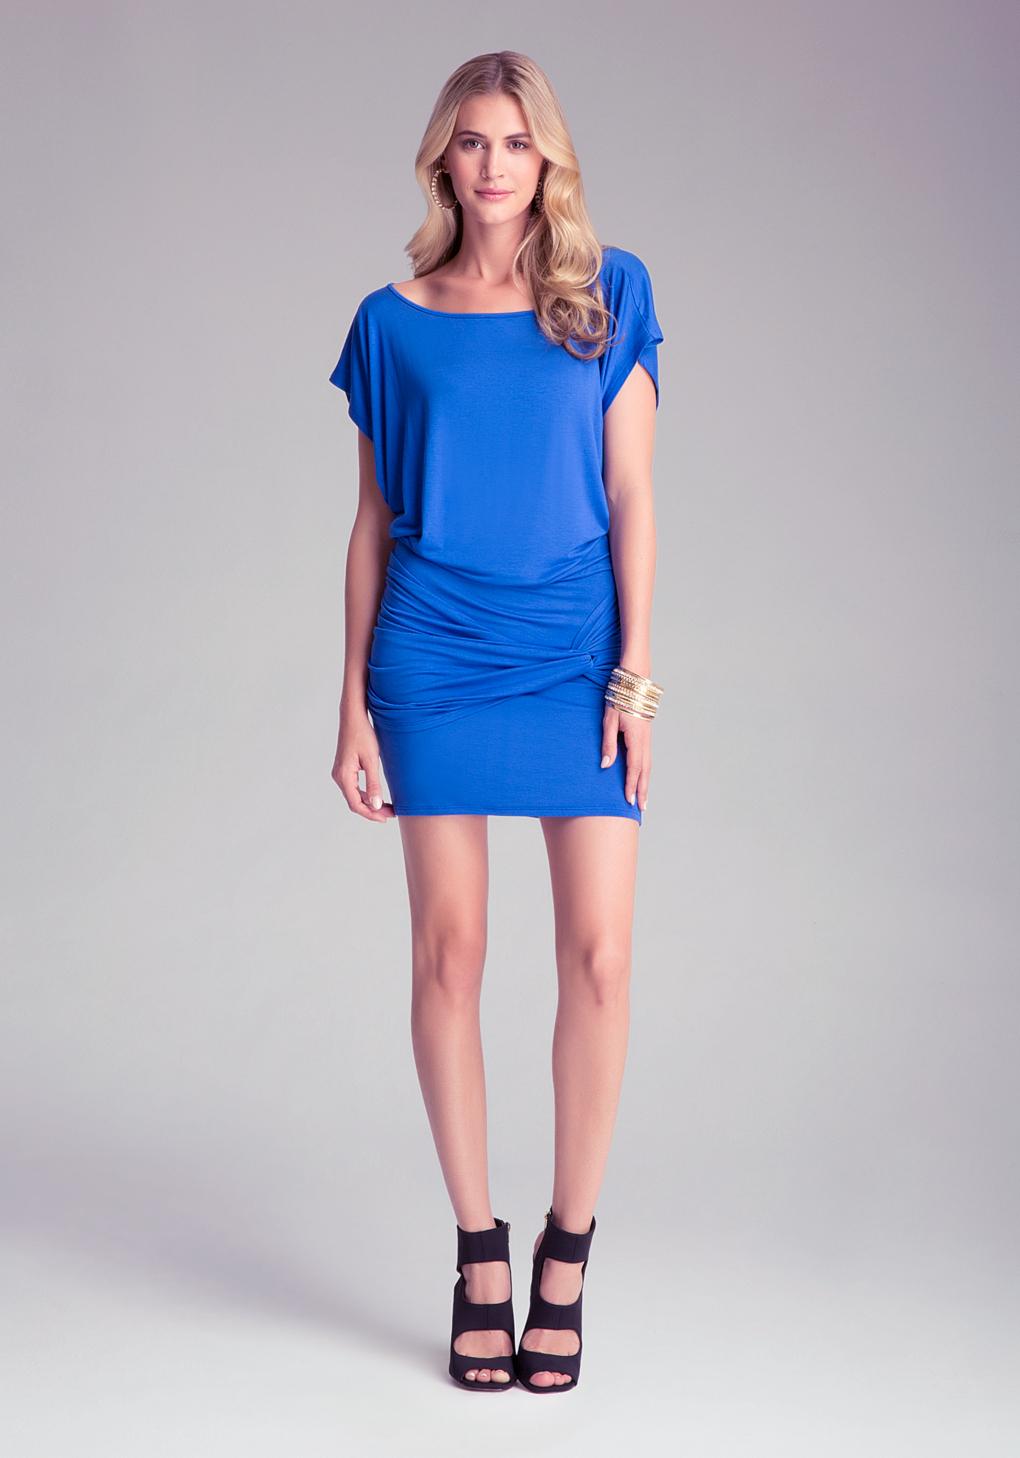 bebe shirred skirt bodycon dress in blue lyst